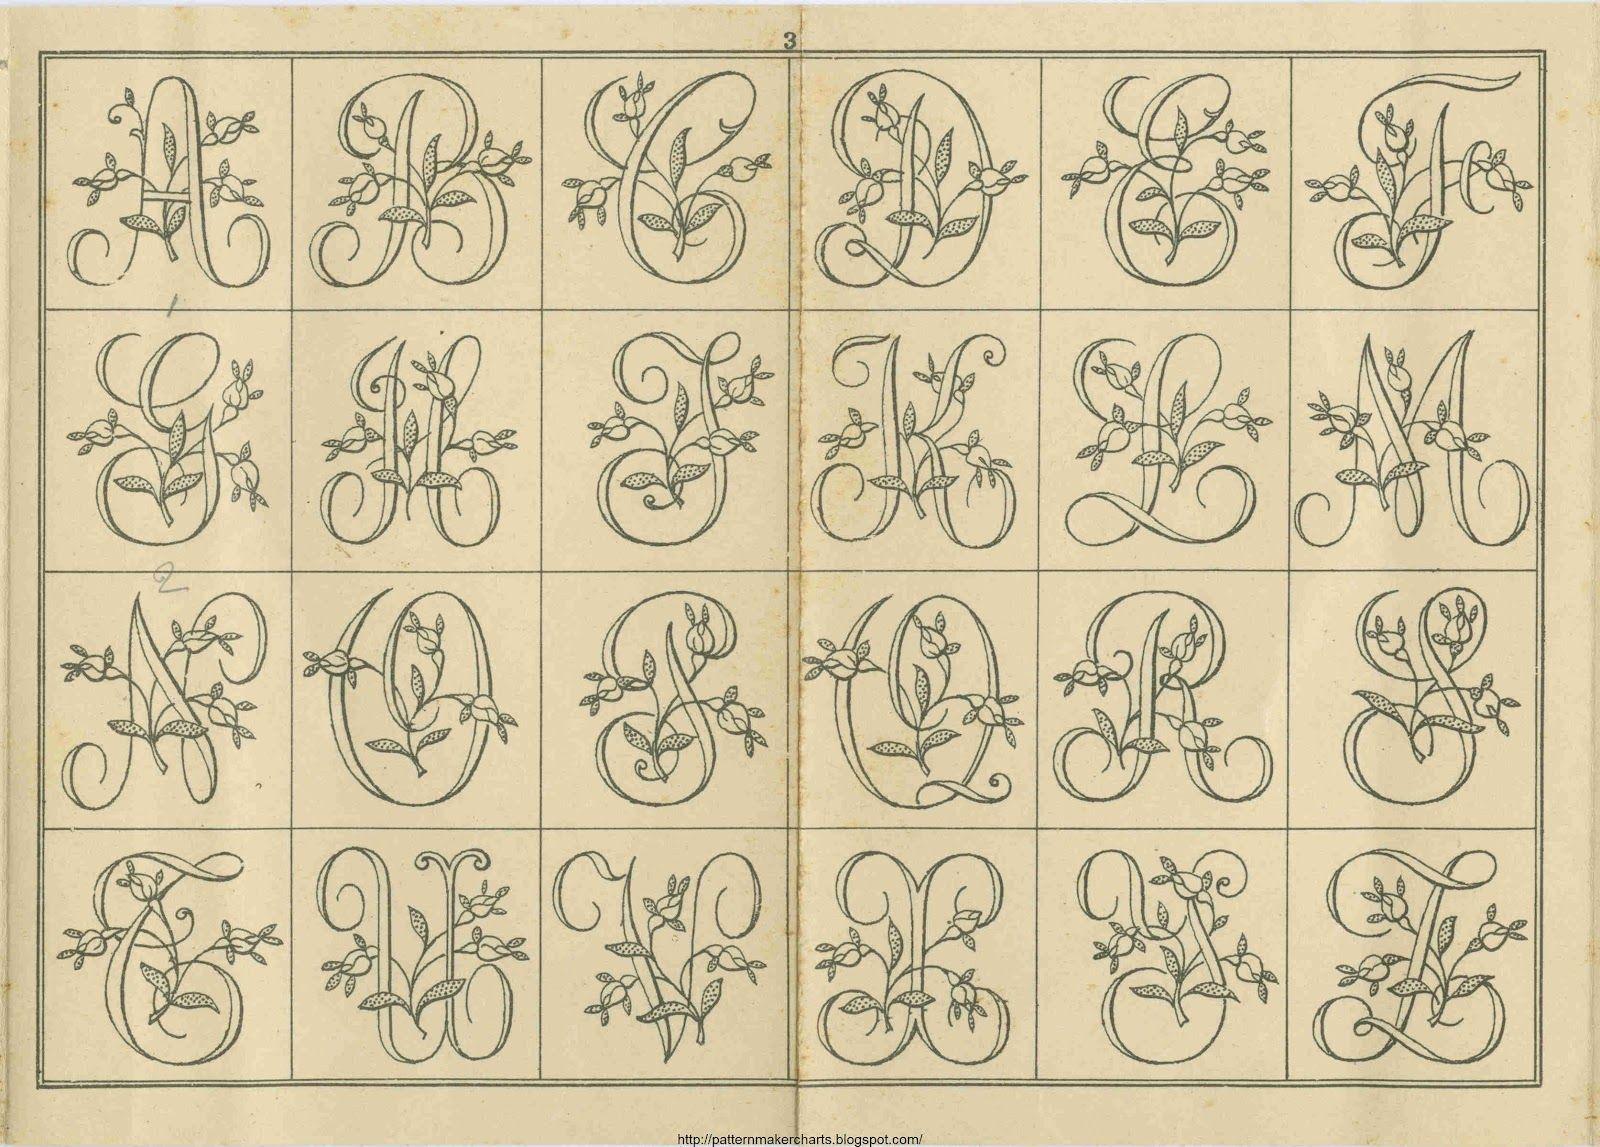 Pin de Guida Moreira en letras | Pinterest | Bordado, Letras y Alfabeto